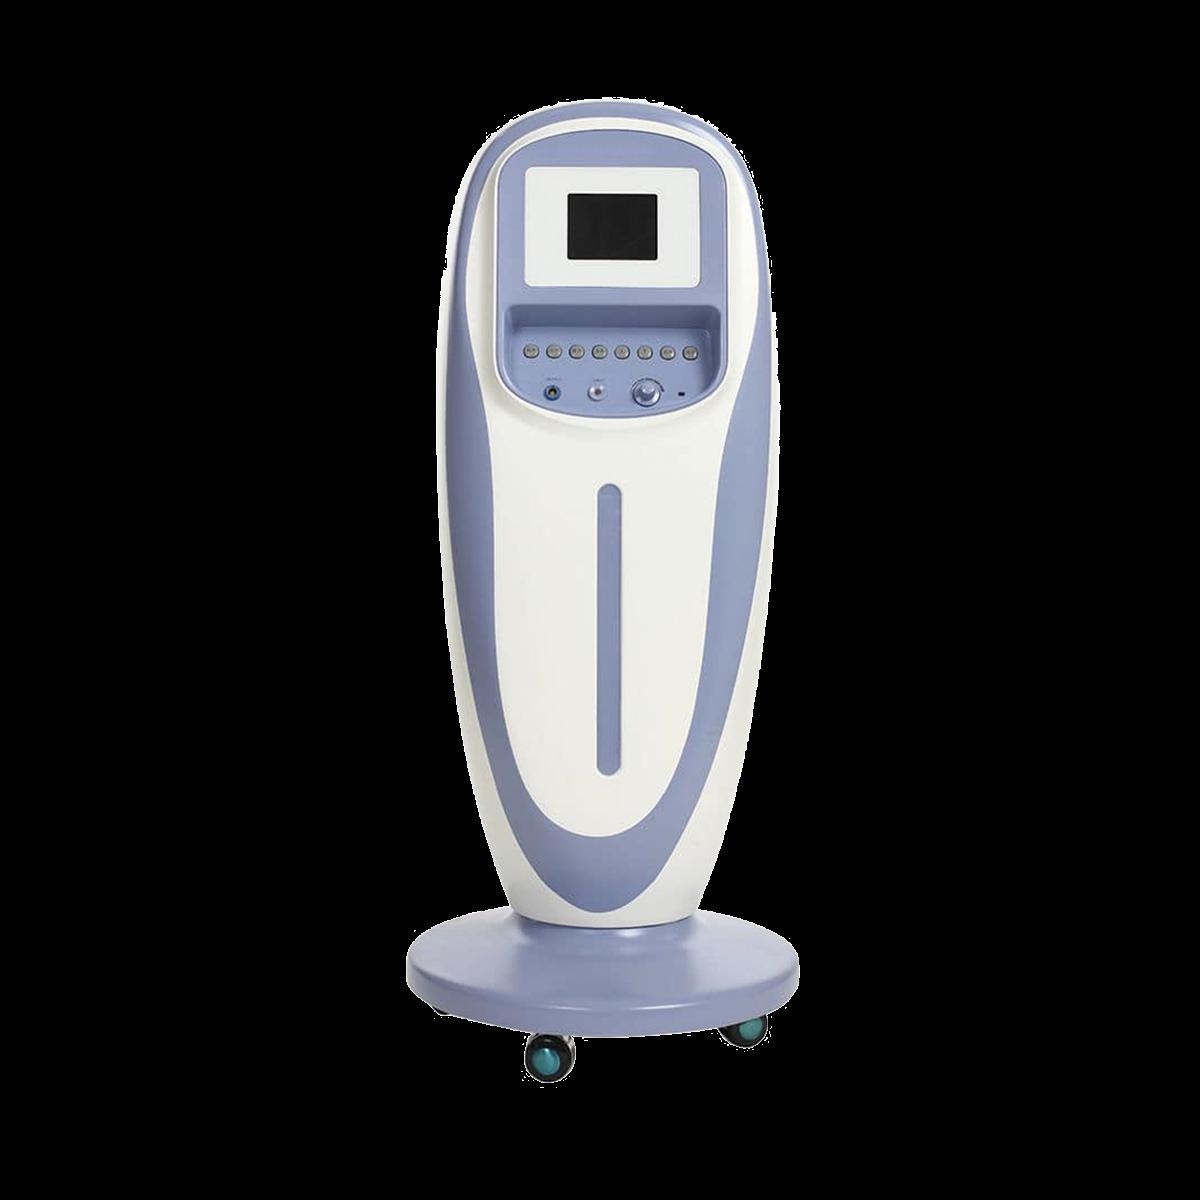 Pelvic electro-stimulators